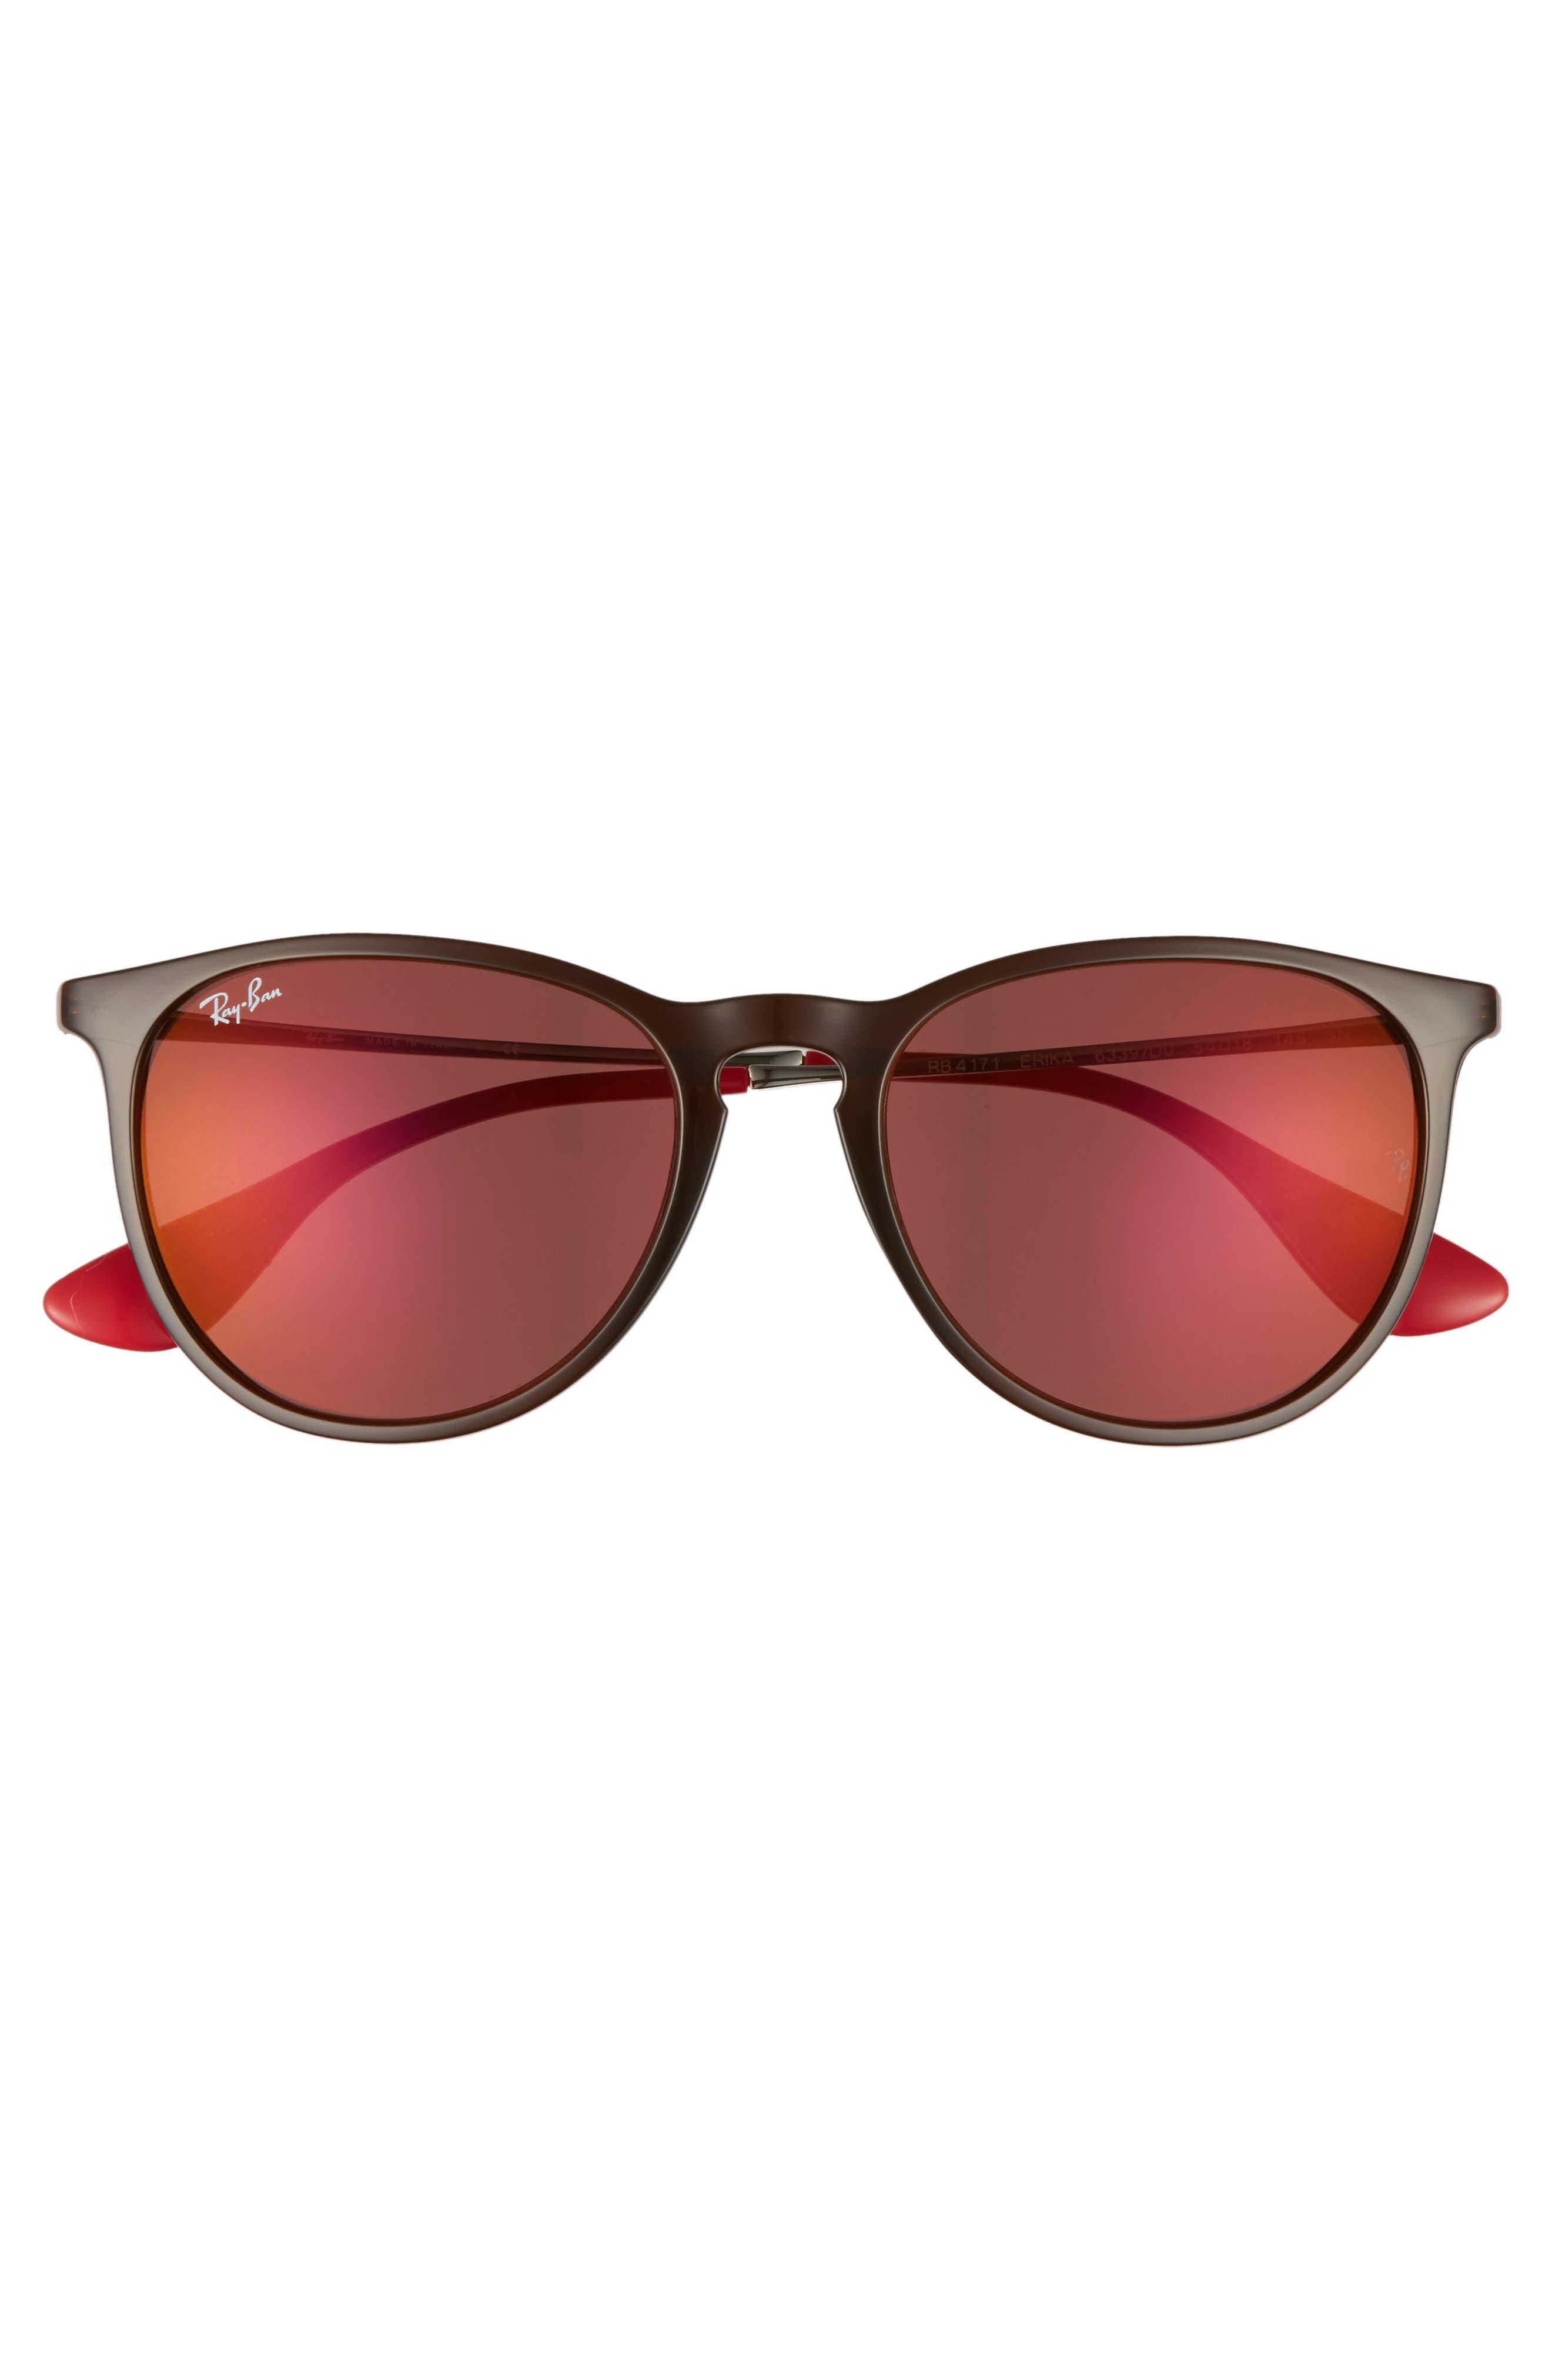 Erika Classic 54mm Sunglasses,                             Alternate thumbnail 3, color,                             203